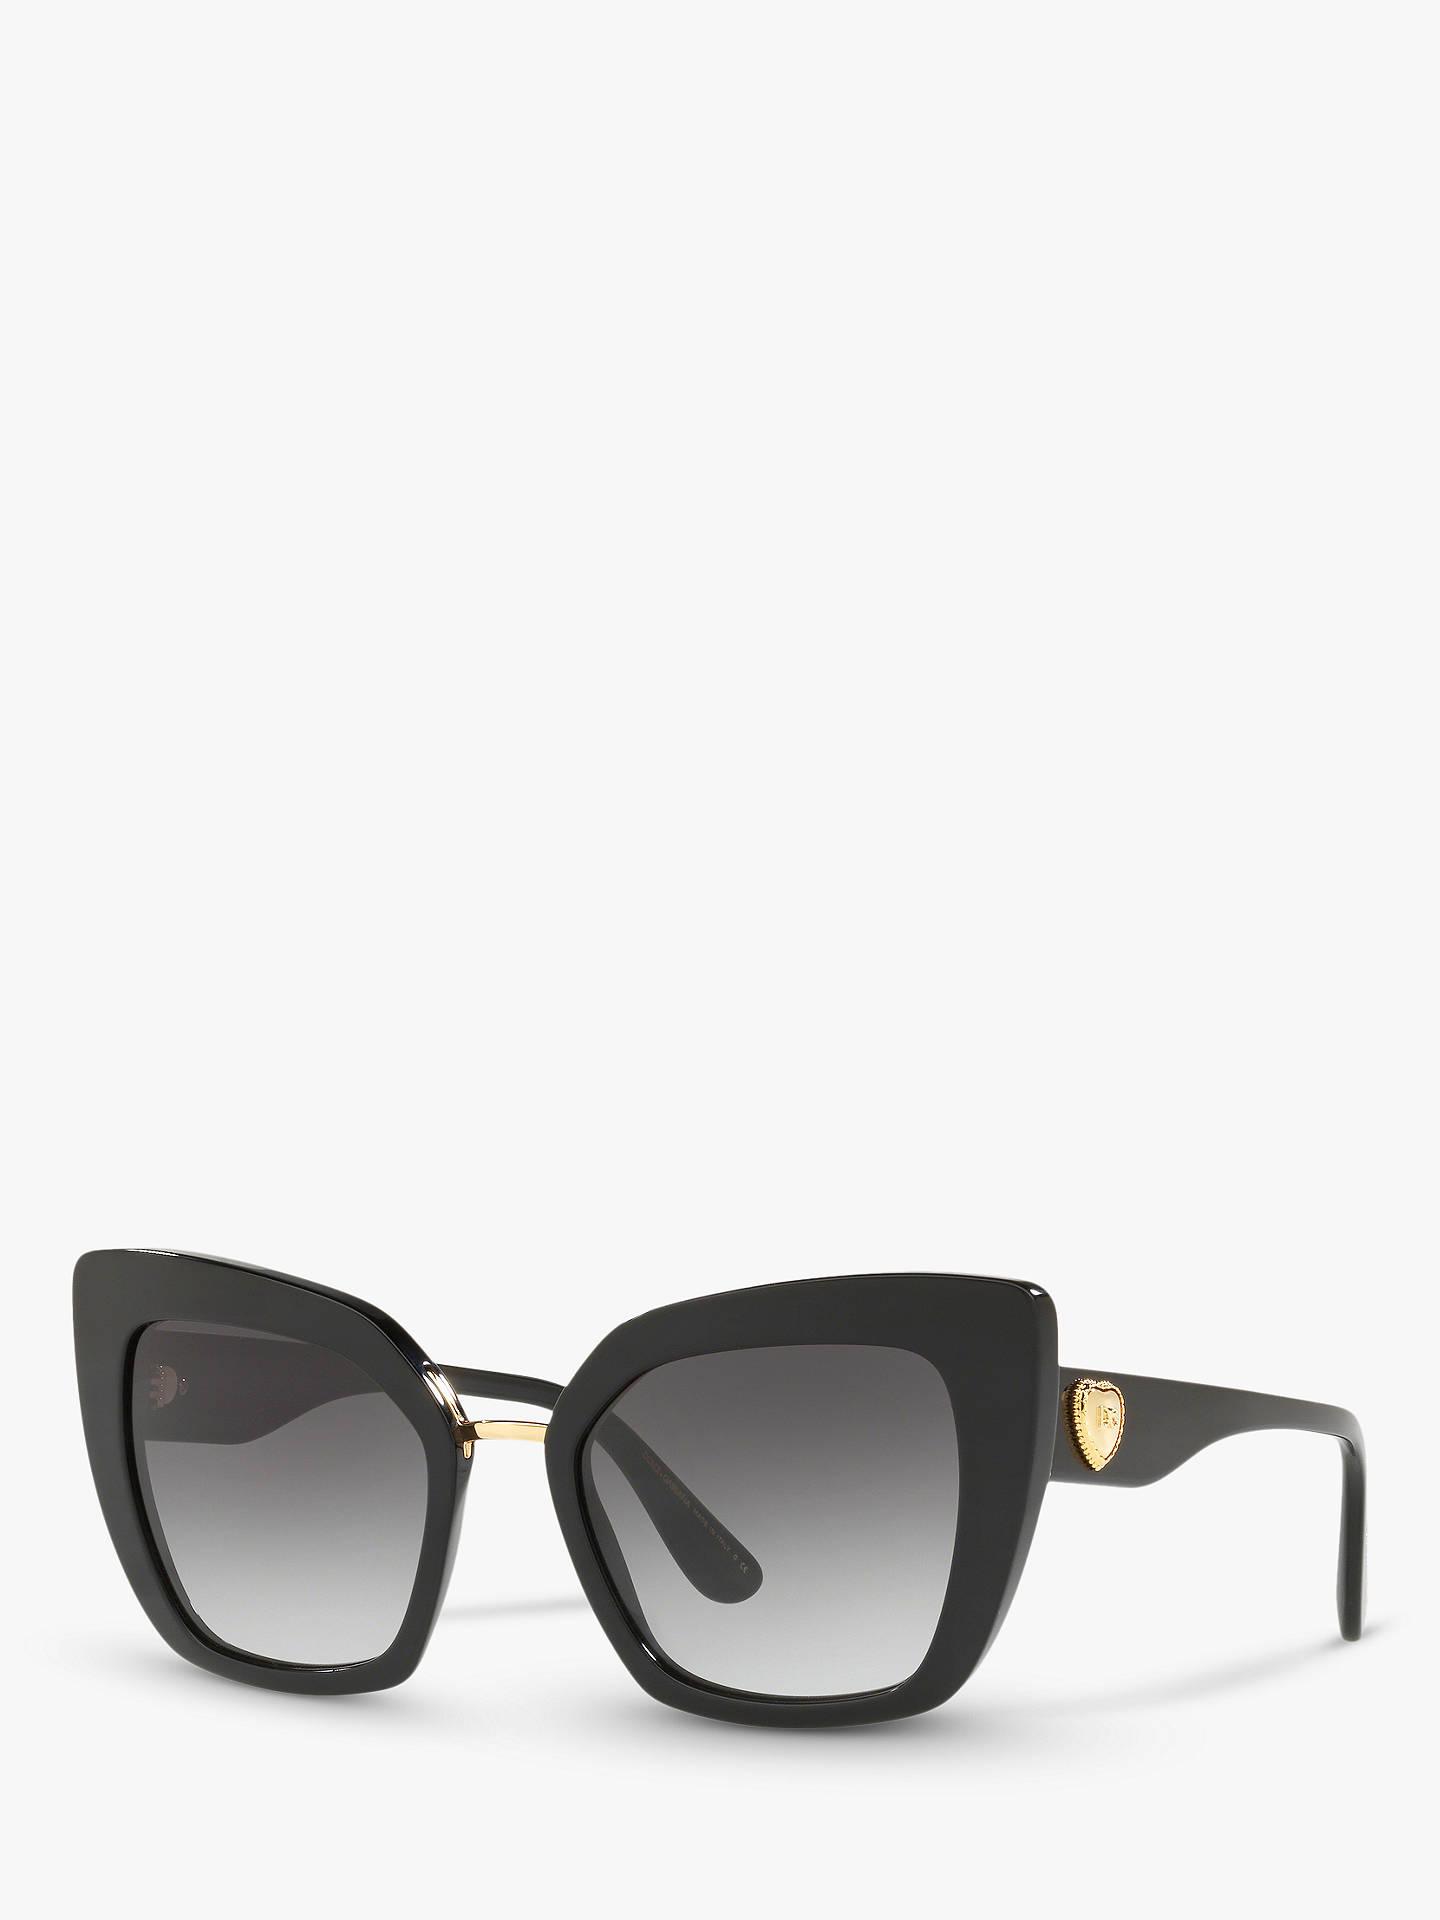 181a2e7f7d22 Buy Dolce & Gabbana DG4359 Women's Cat's Eye Sunglasses, Black/Grey Gradient  Online at ...